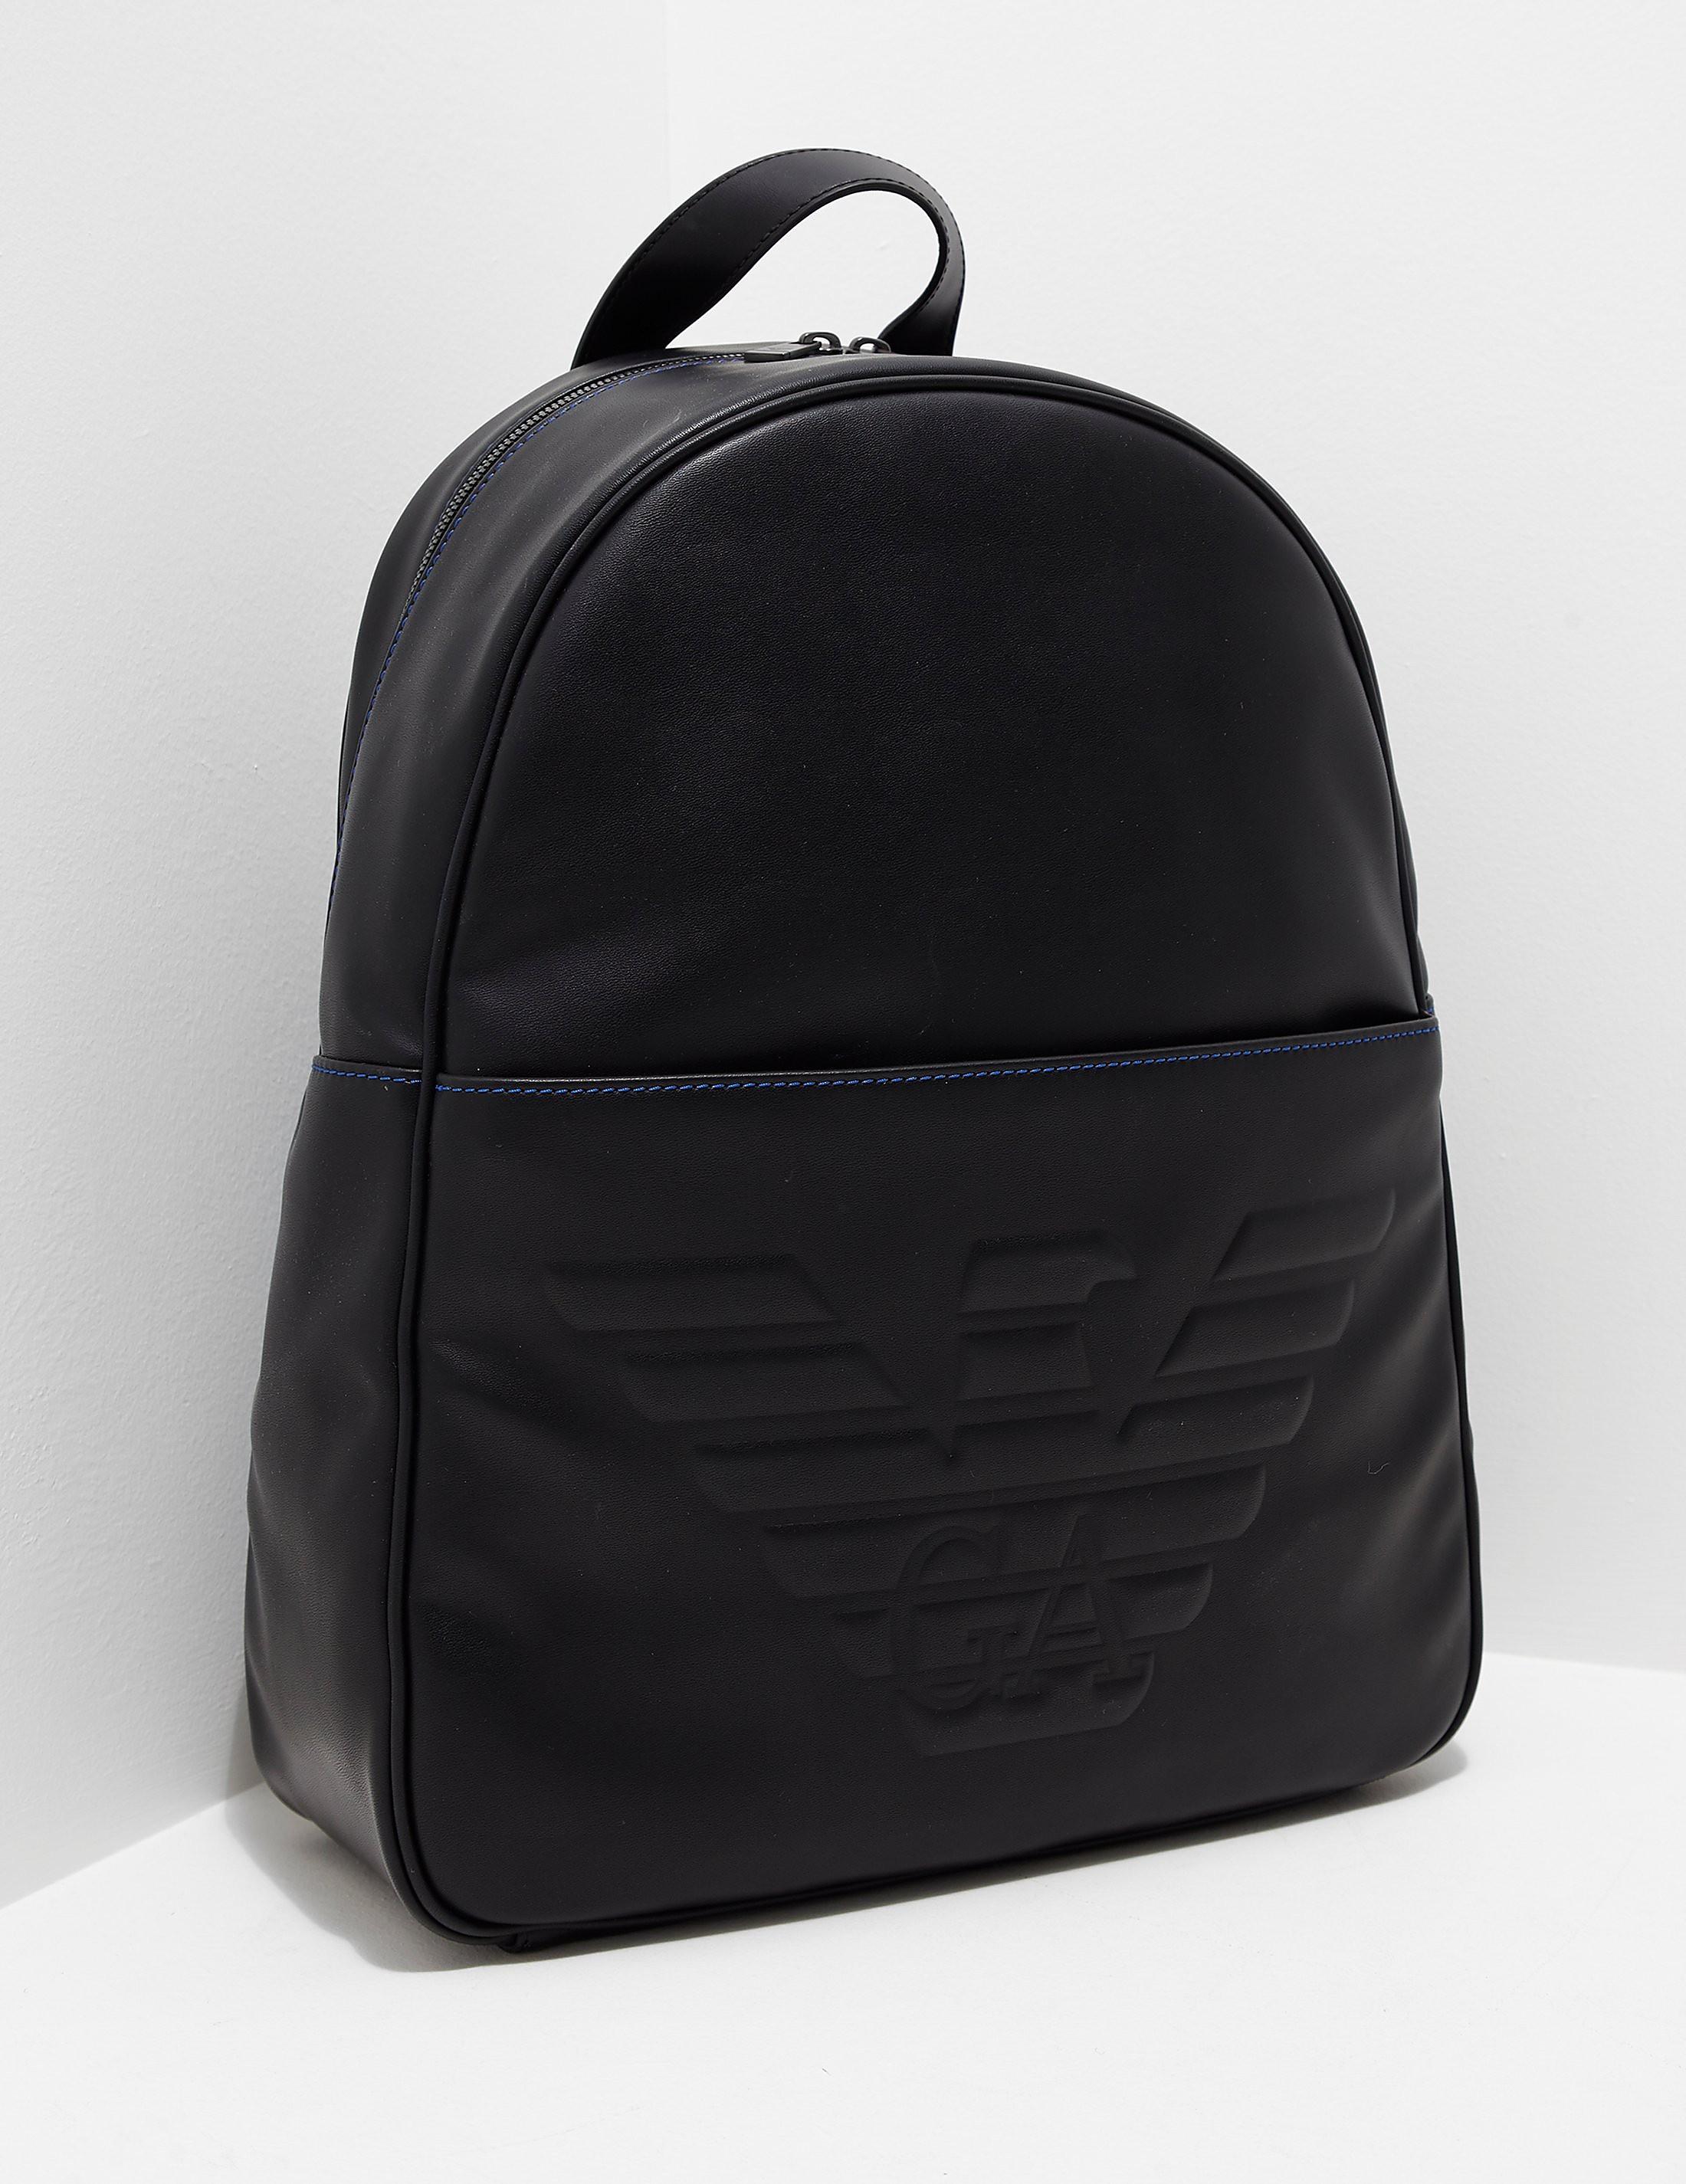 Armani Jeans Eagle Backpack